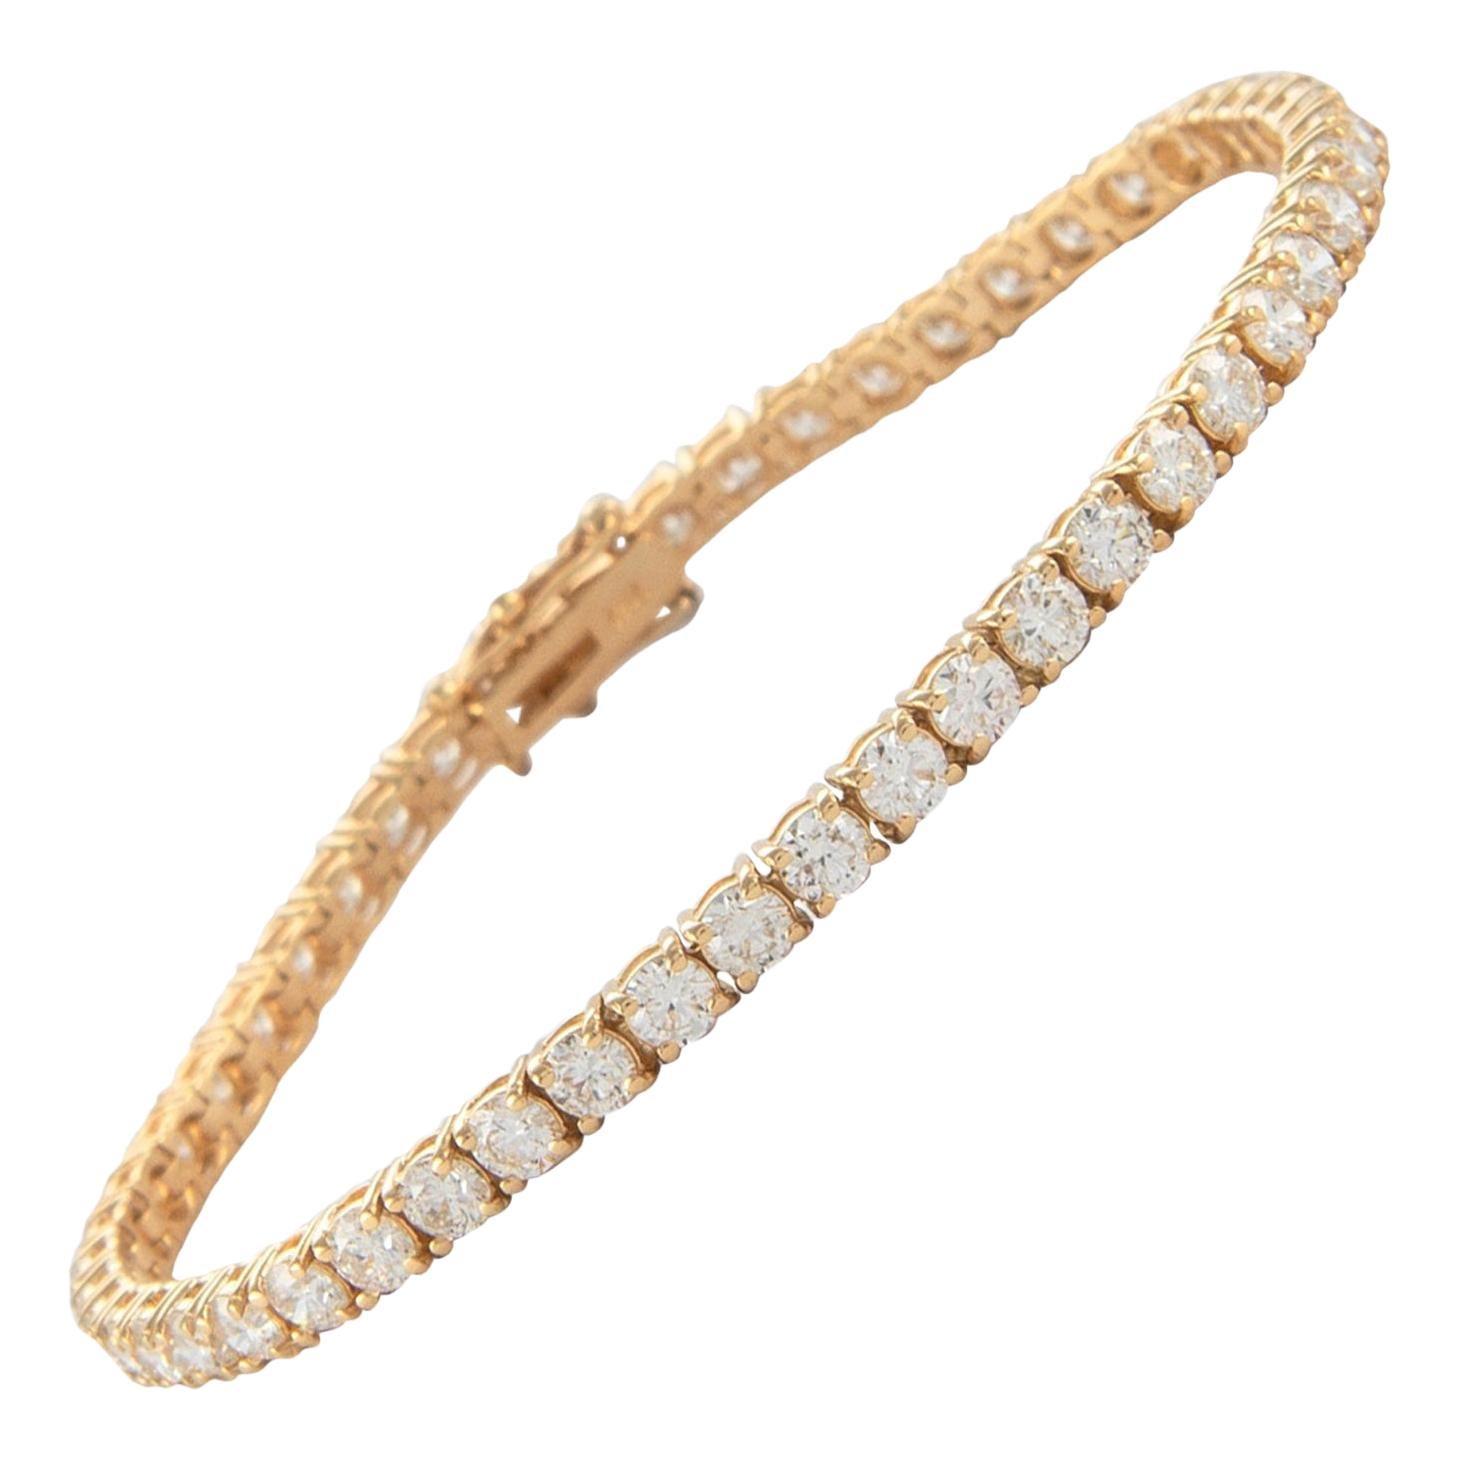 Alexander 6.19 Carat Diamond Tennis Bracelet 18 Karat Yellow Gold